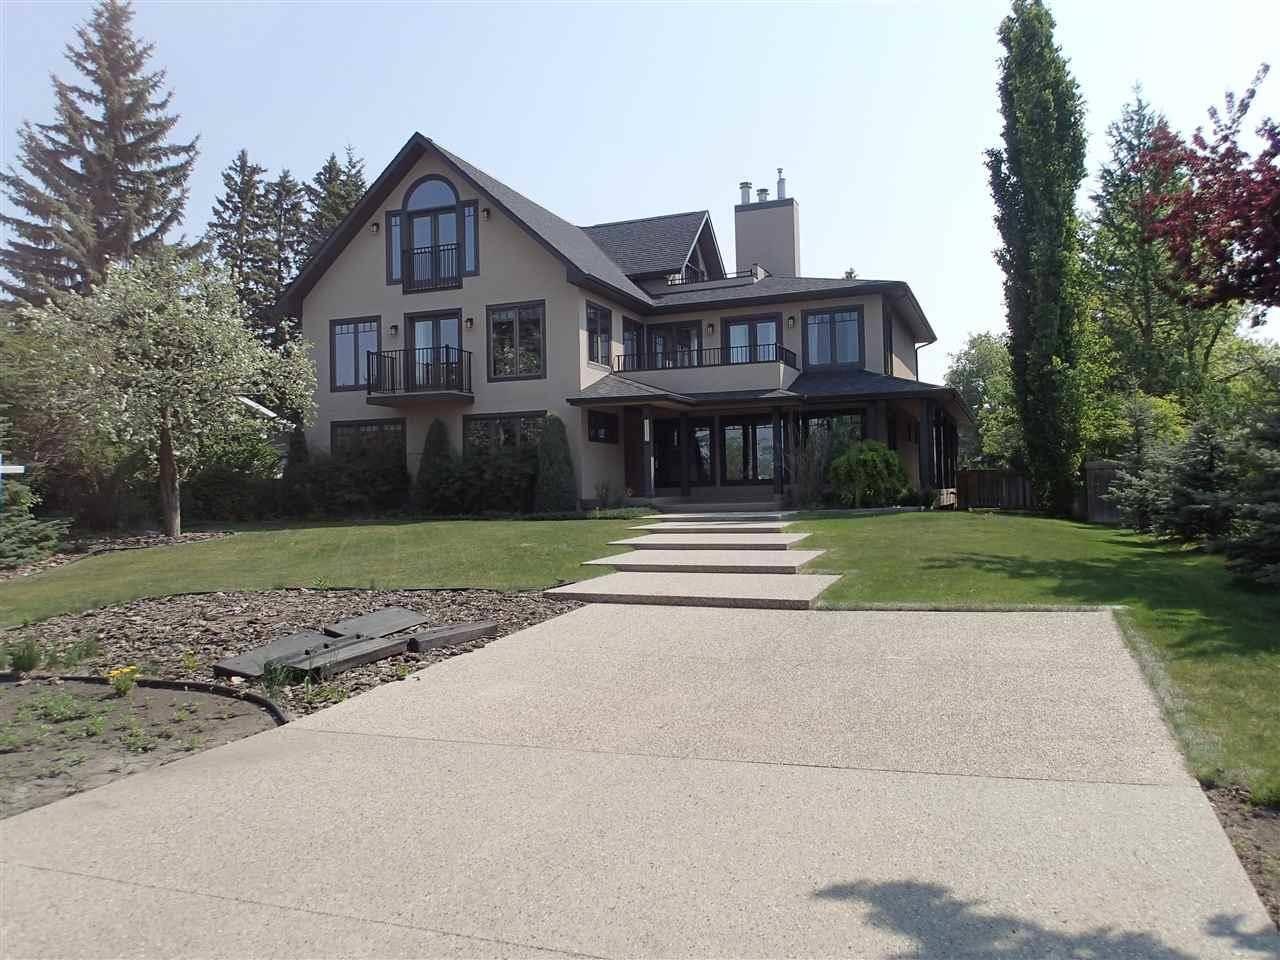 House for sale at 7903 Saskatchewan Dr Nw Edmonton Alberta - MLS: E4176045